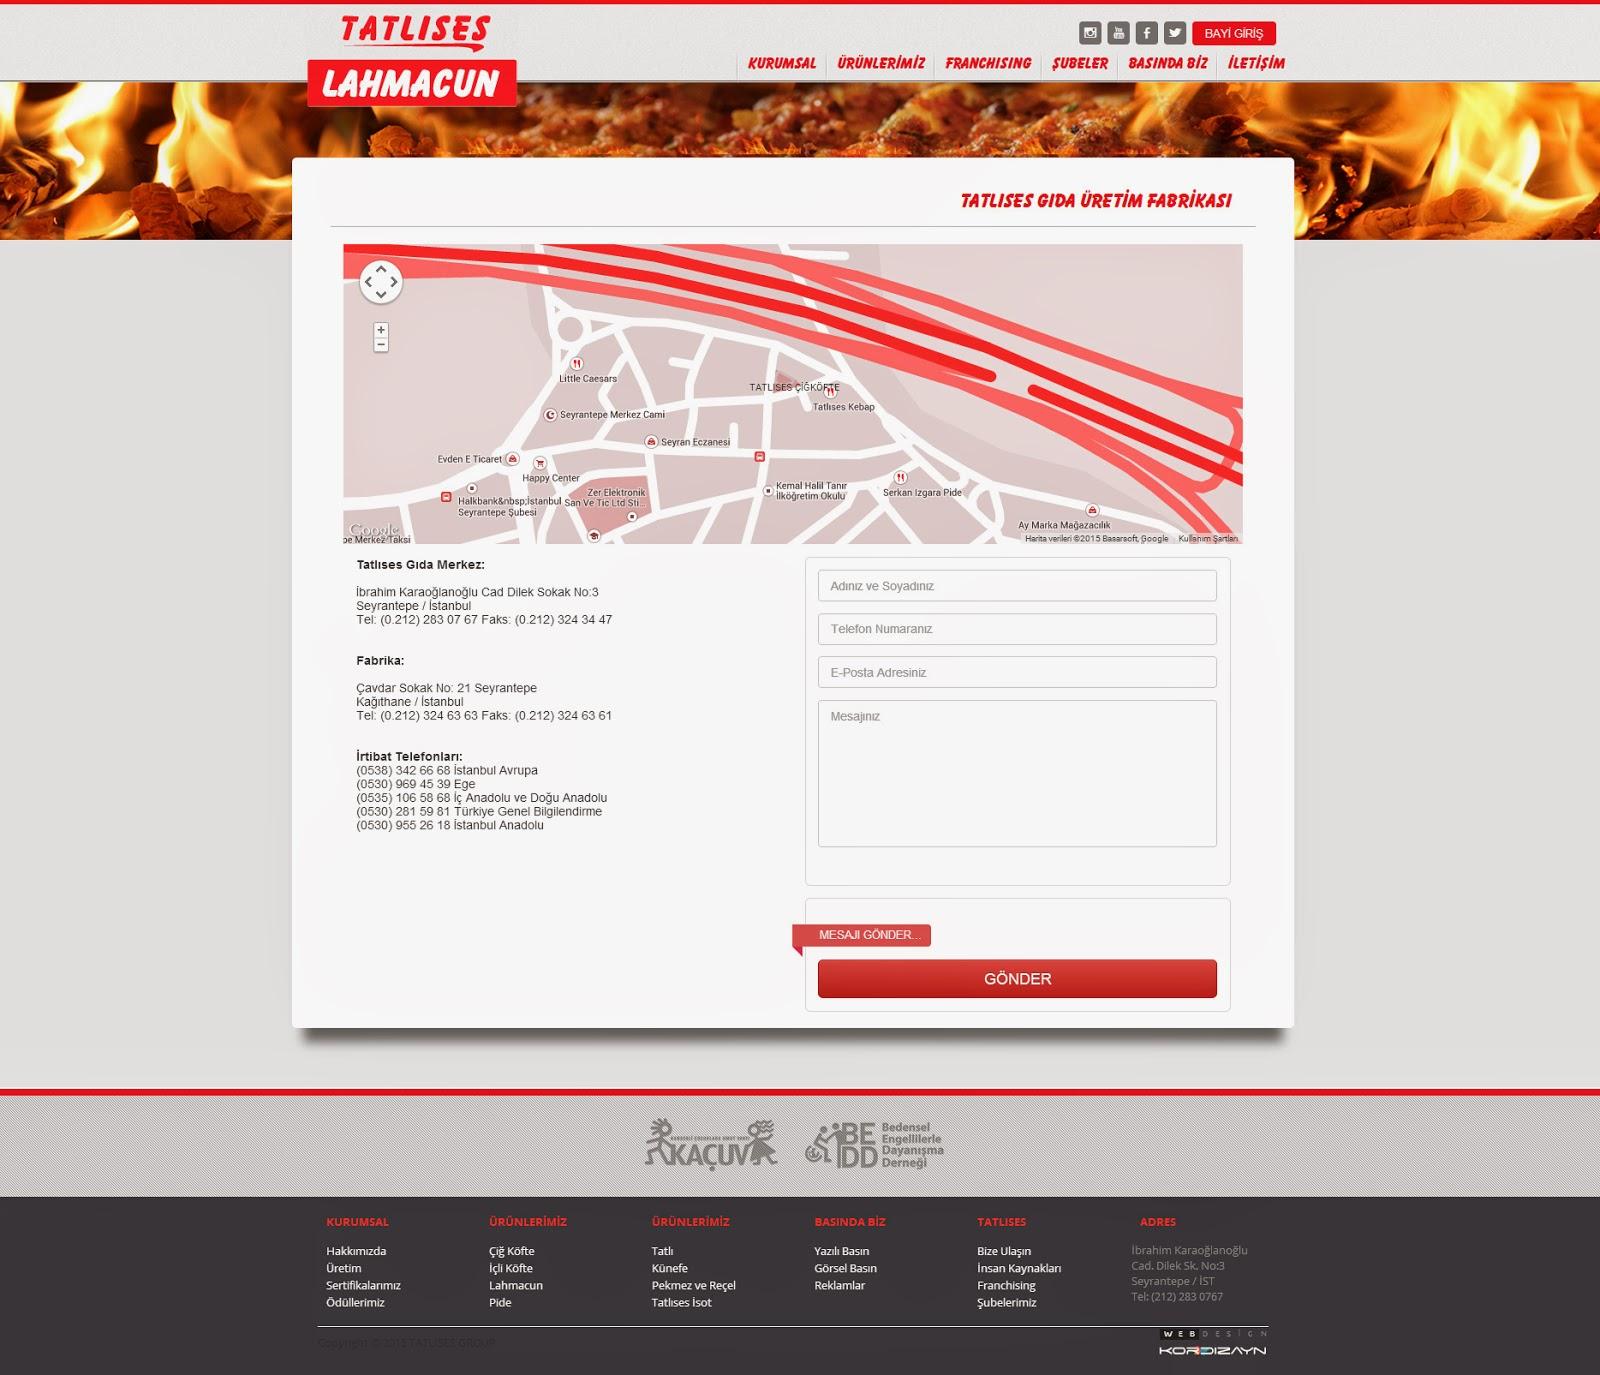 Tatlıses Lahmacun Web Tasarım - AltSayfa Detay